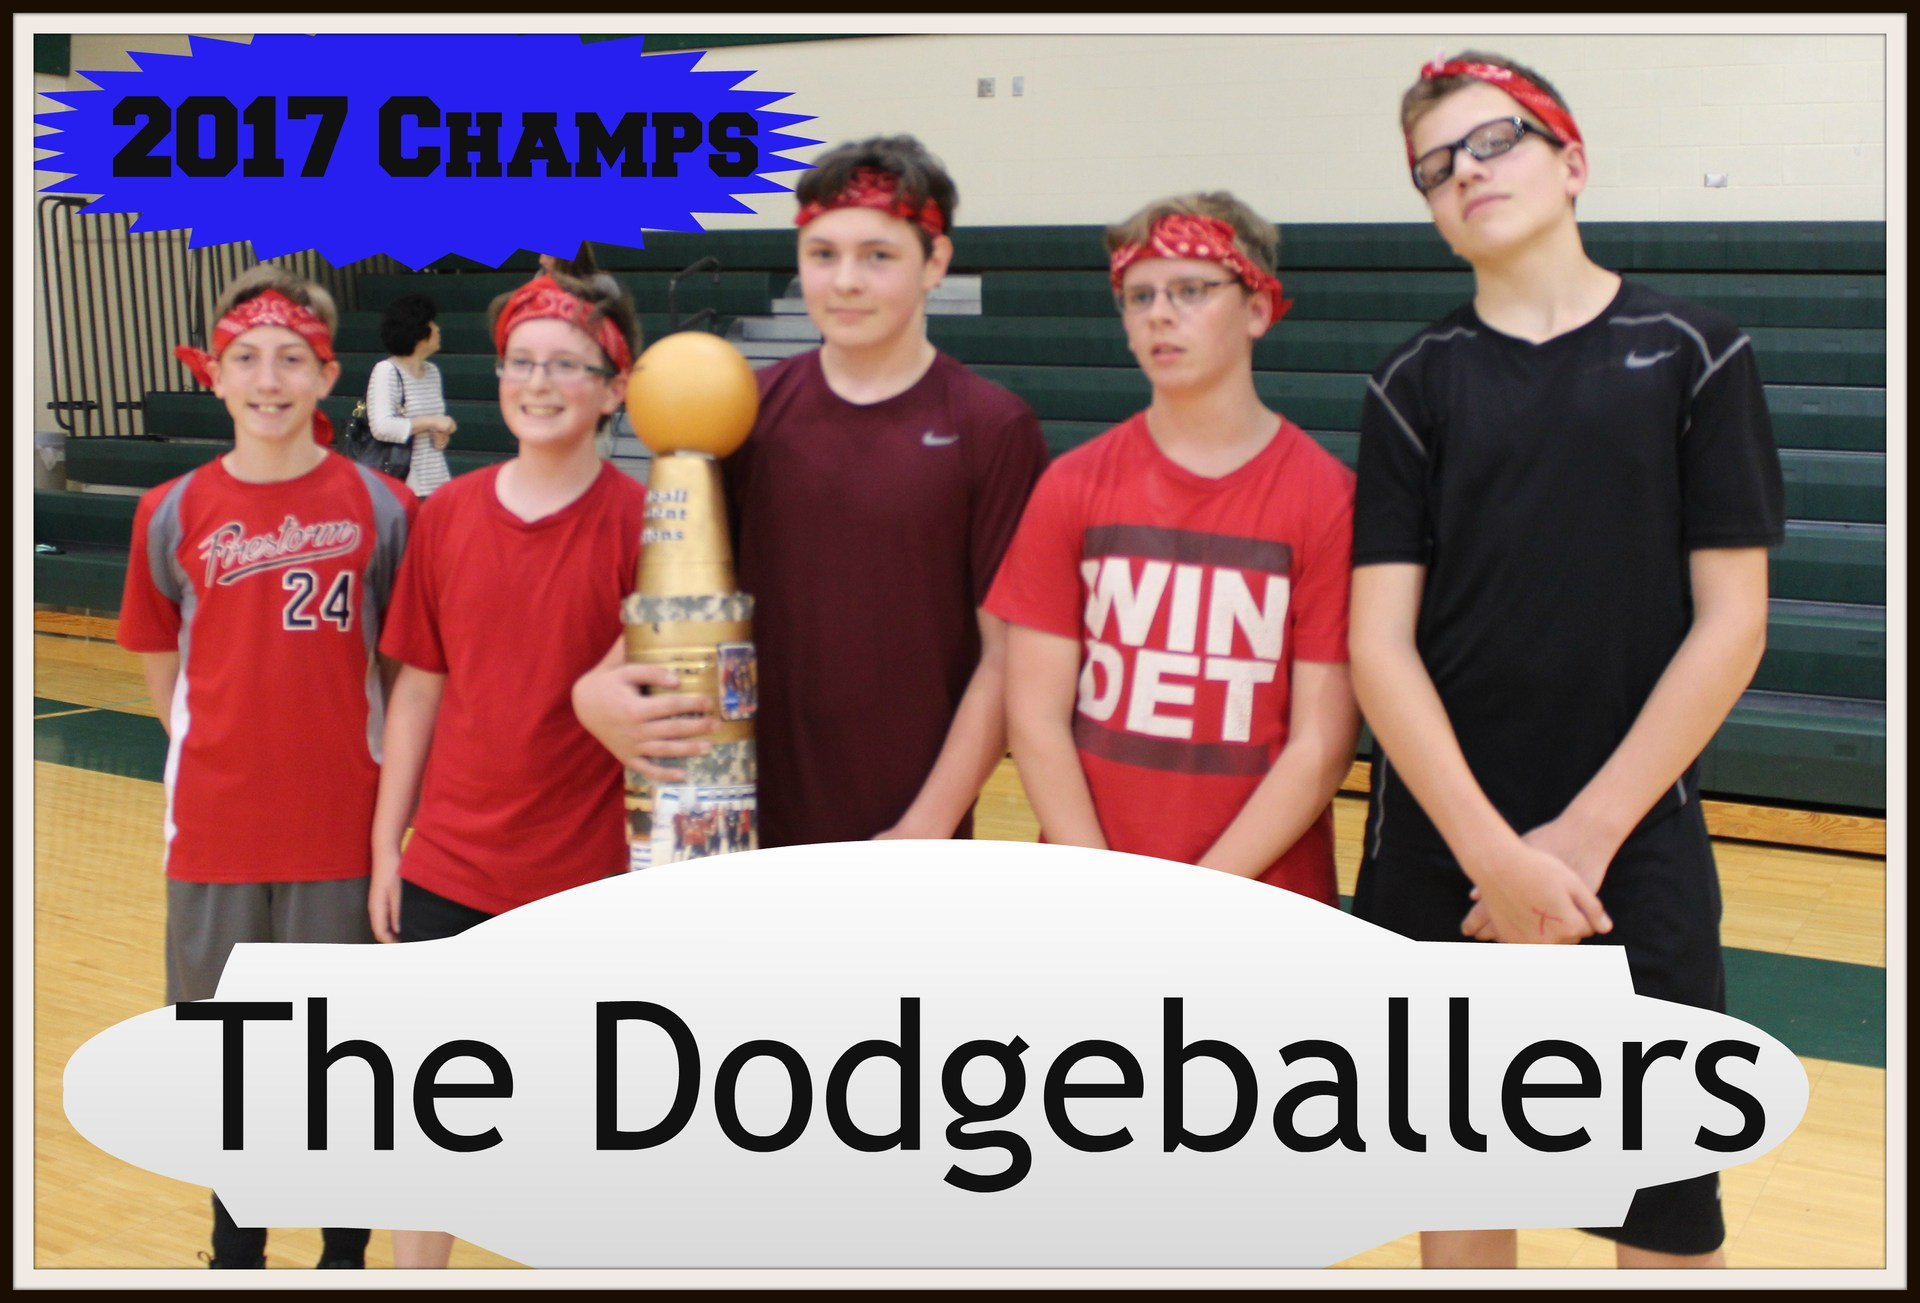 2017 Champs Dodgeballers